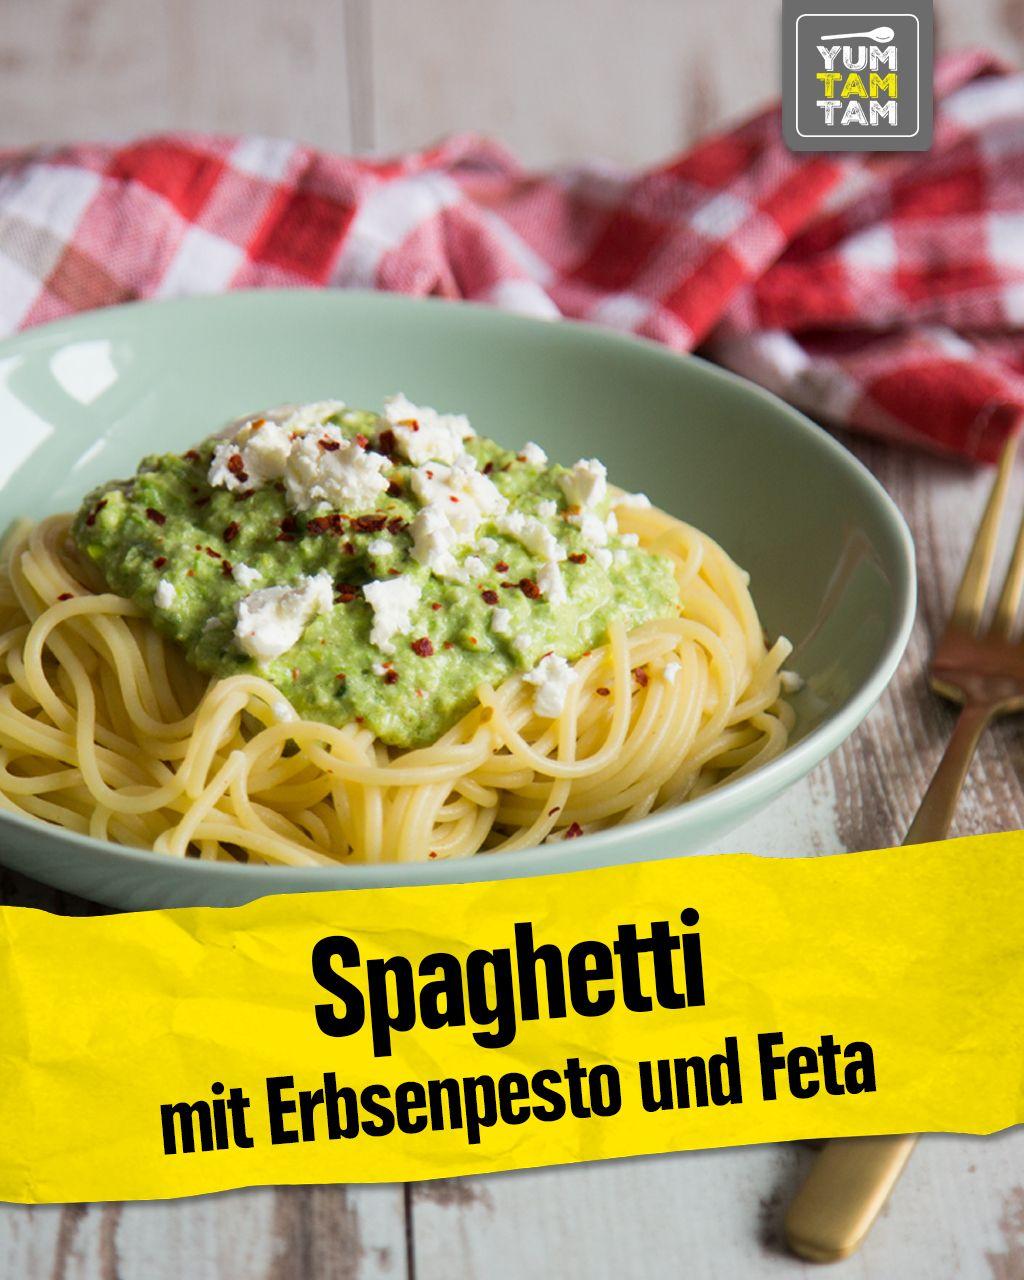 Spaghetti mit Erbsenpesto und Feta